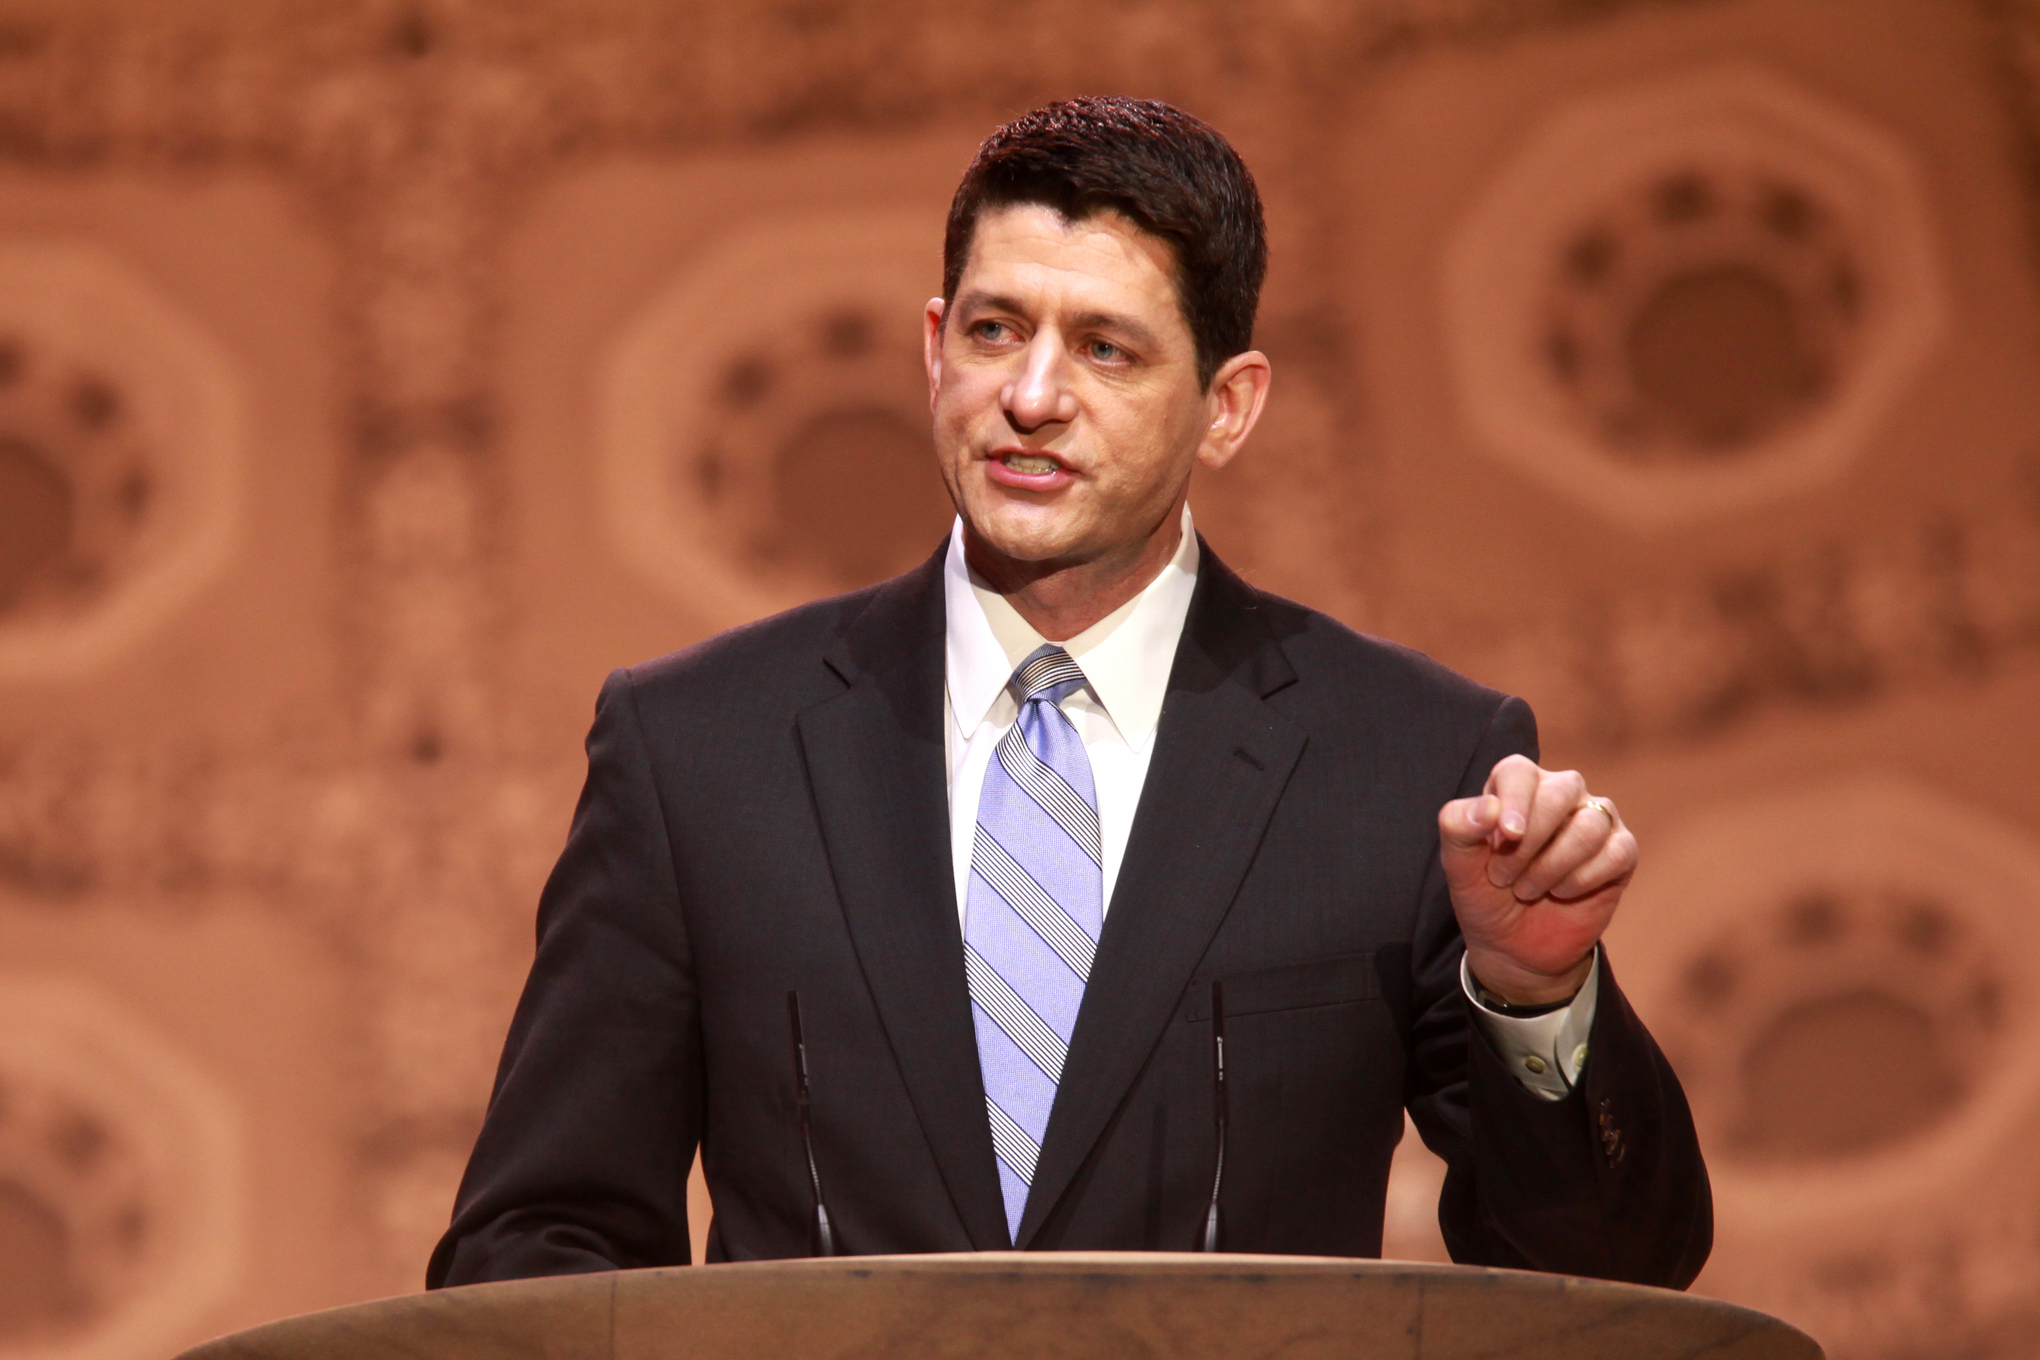 Paul Ryan at CPAC